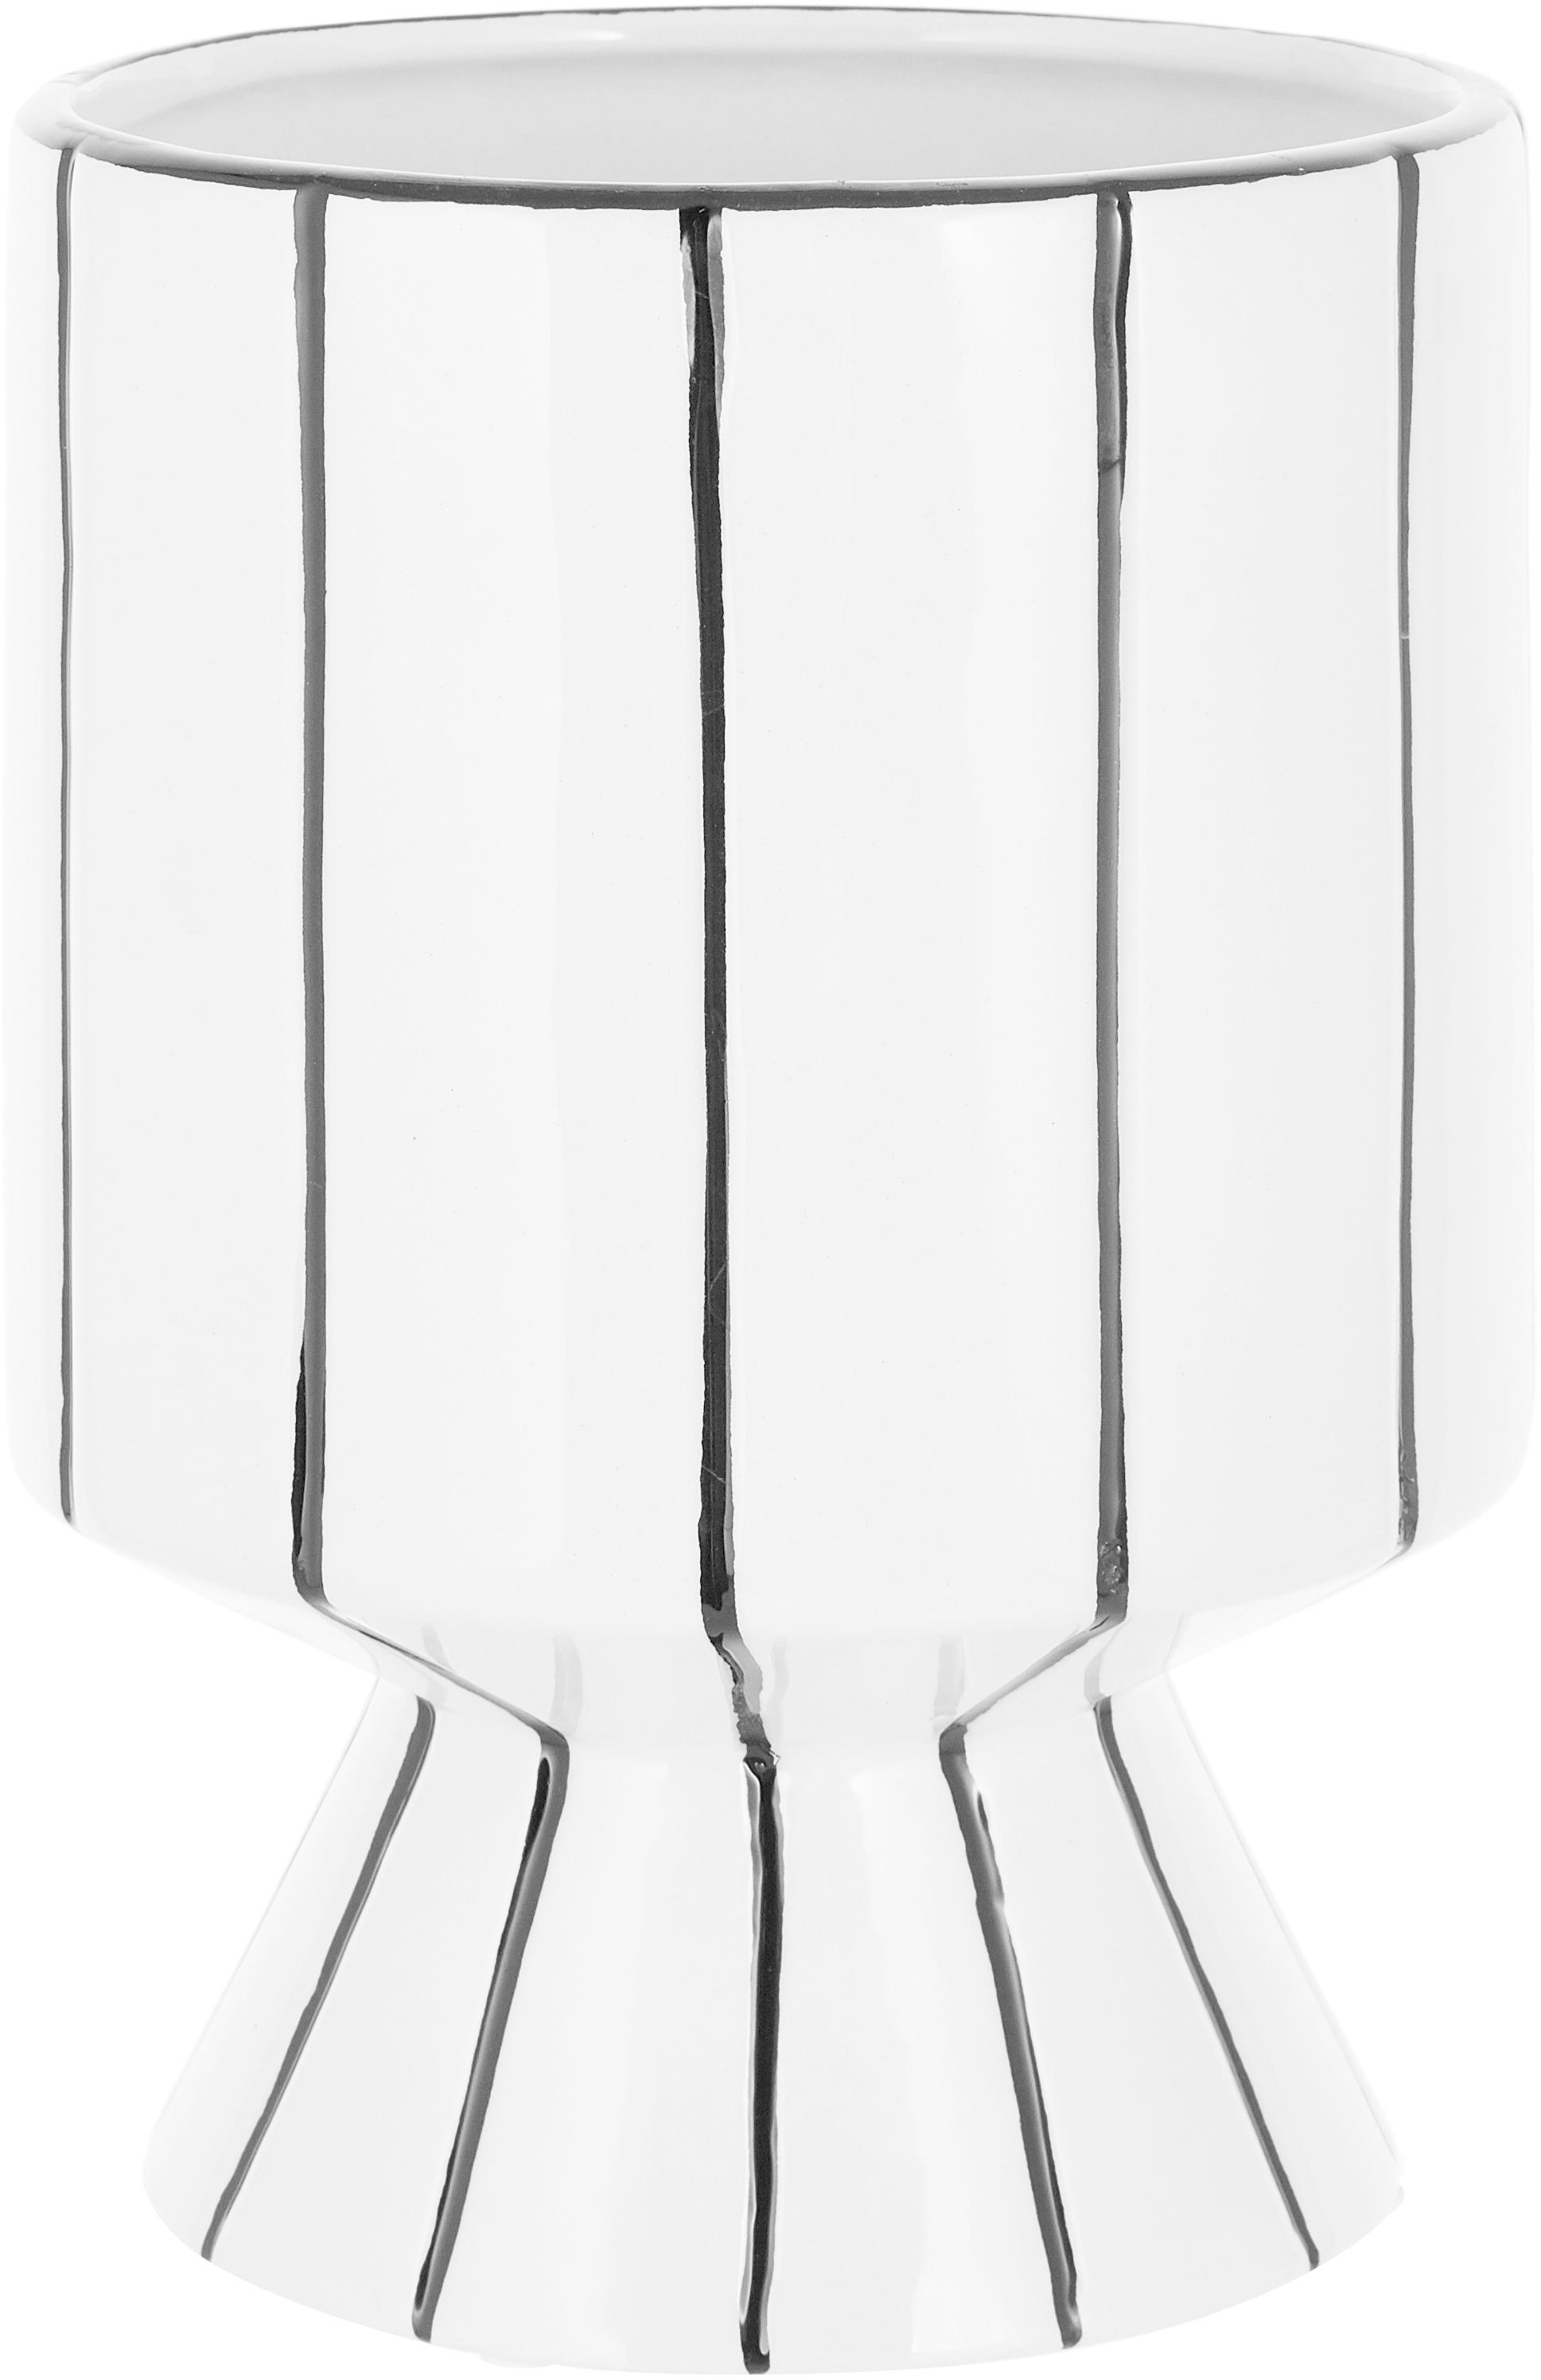 Portavaso in terracotta Reno, Terracotta, Bianco, nero, Ø 14 x Alt. 20 cm